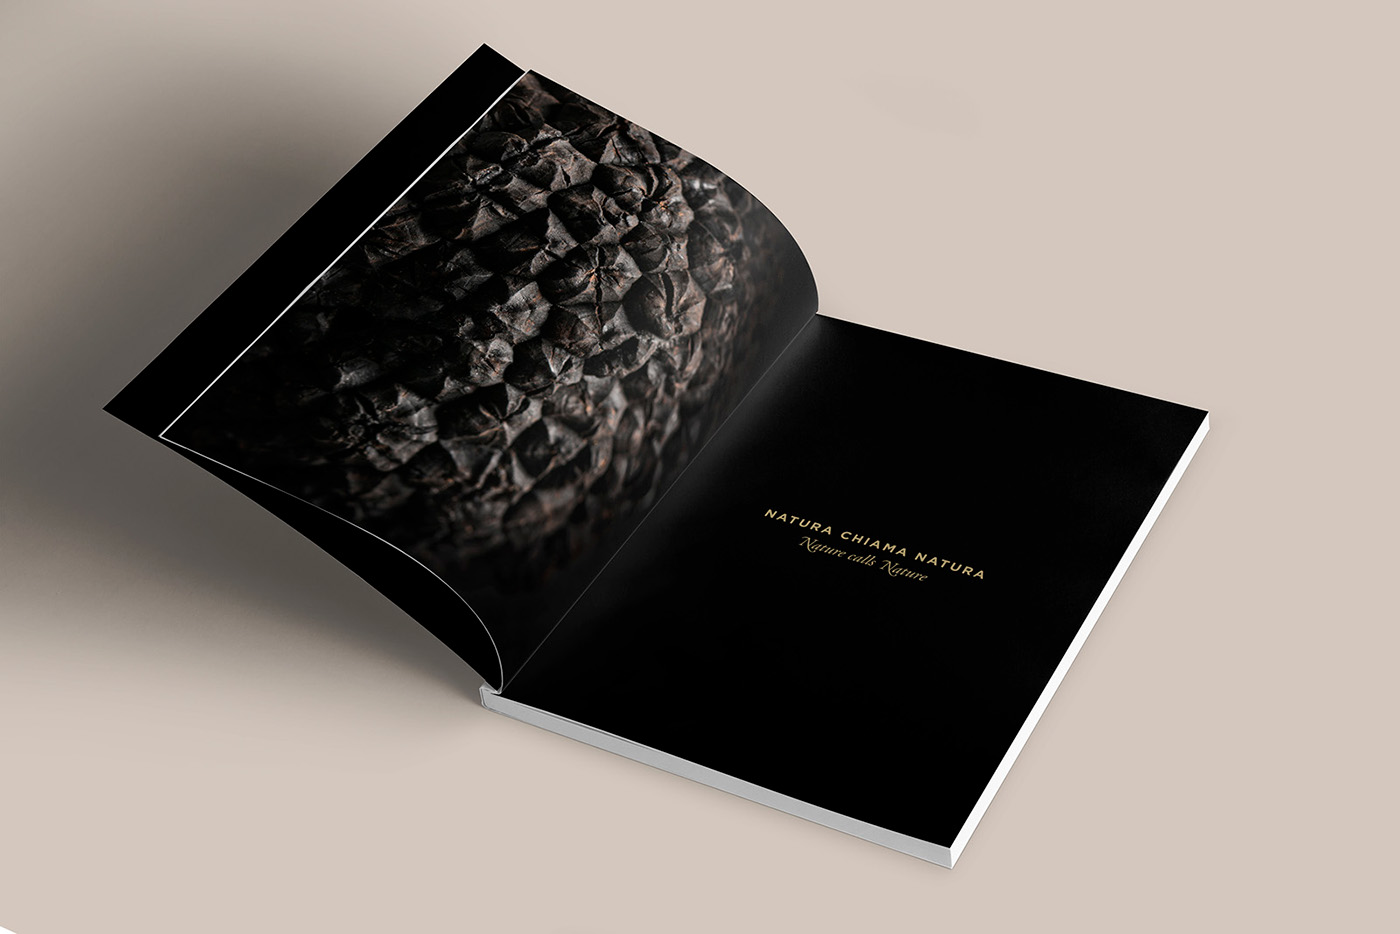 brochure truffles tartufi raffinerie